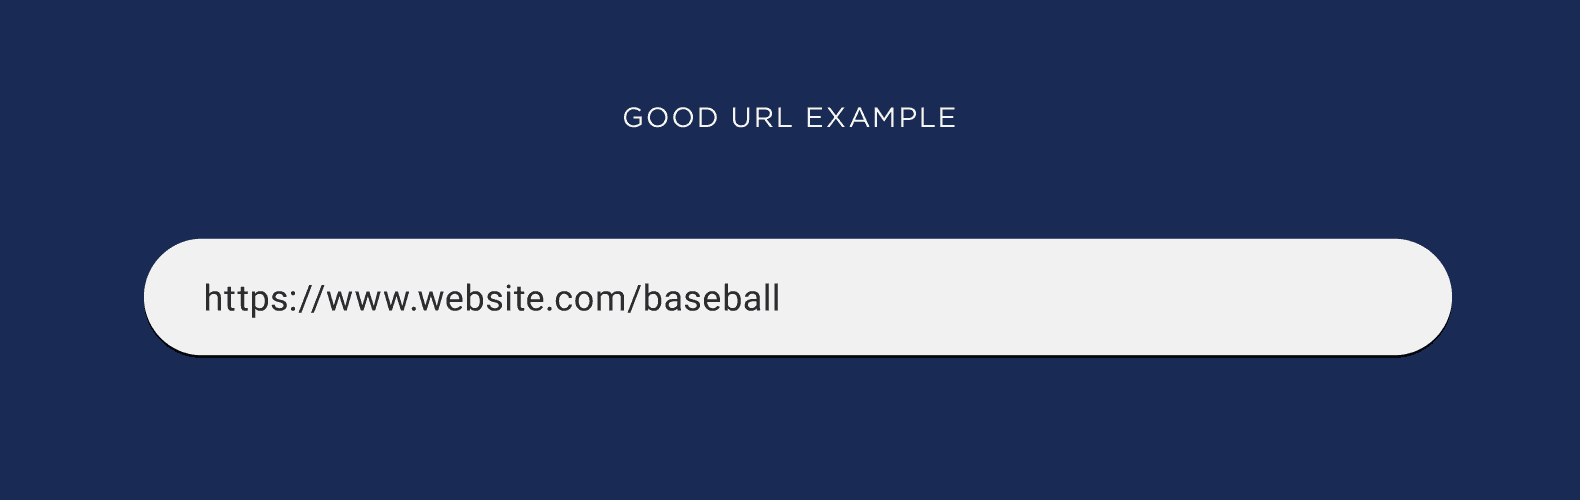 Good URL example